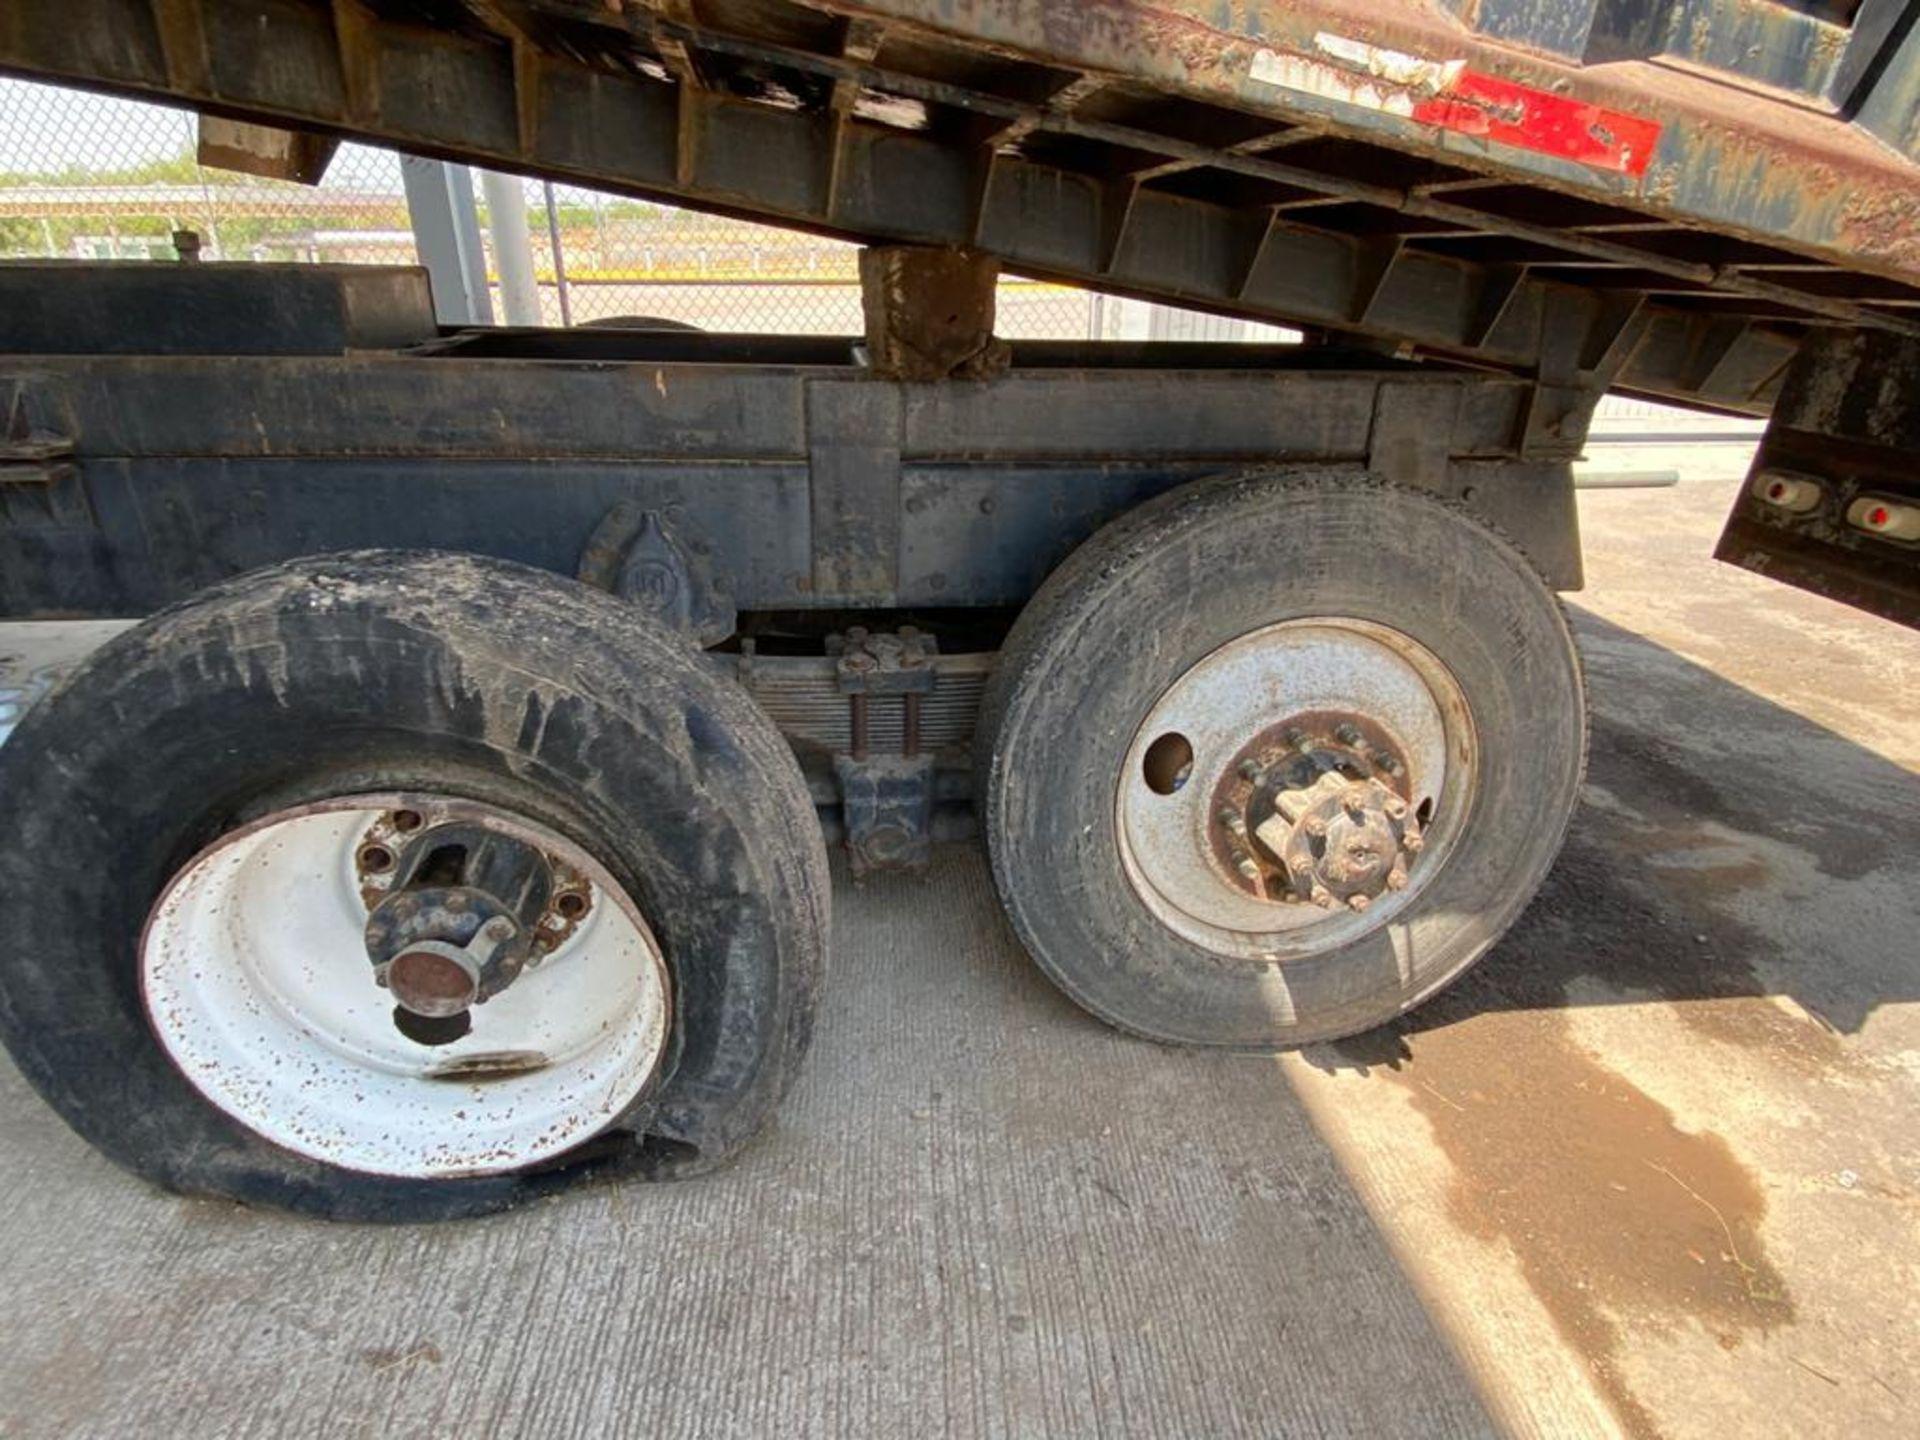 1983 Kenworth Dump Truck, standard transmission of 10 speeds, with Cummins motor - Image 57 of 68